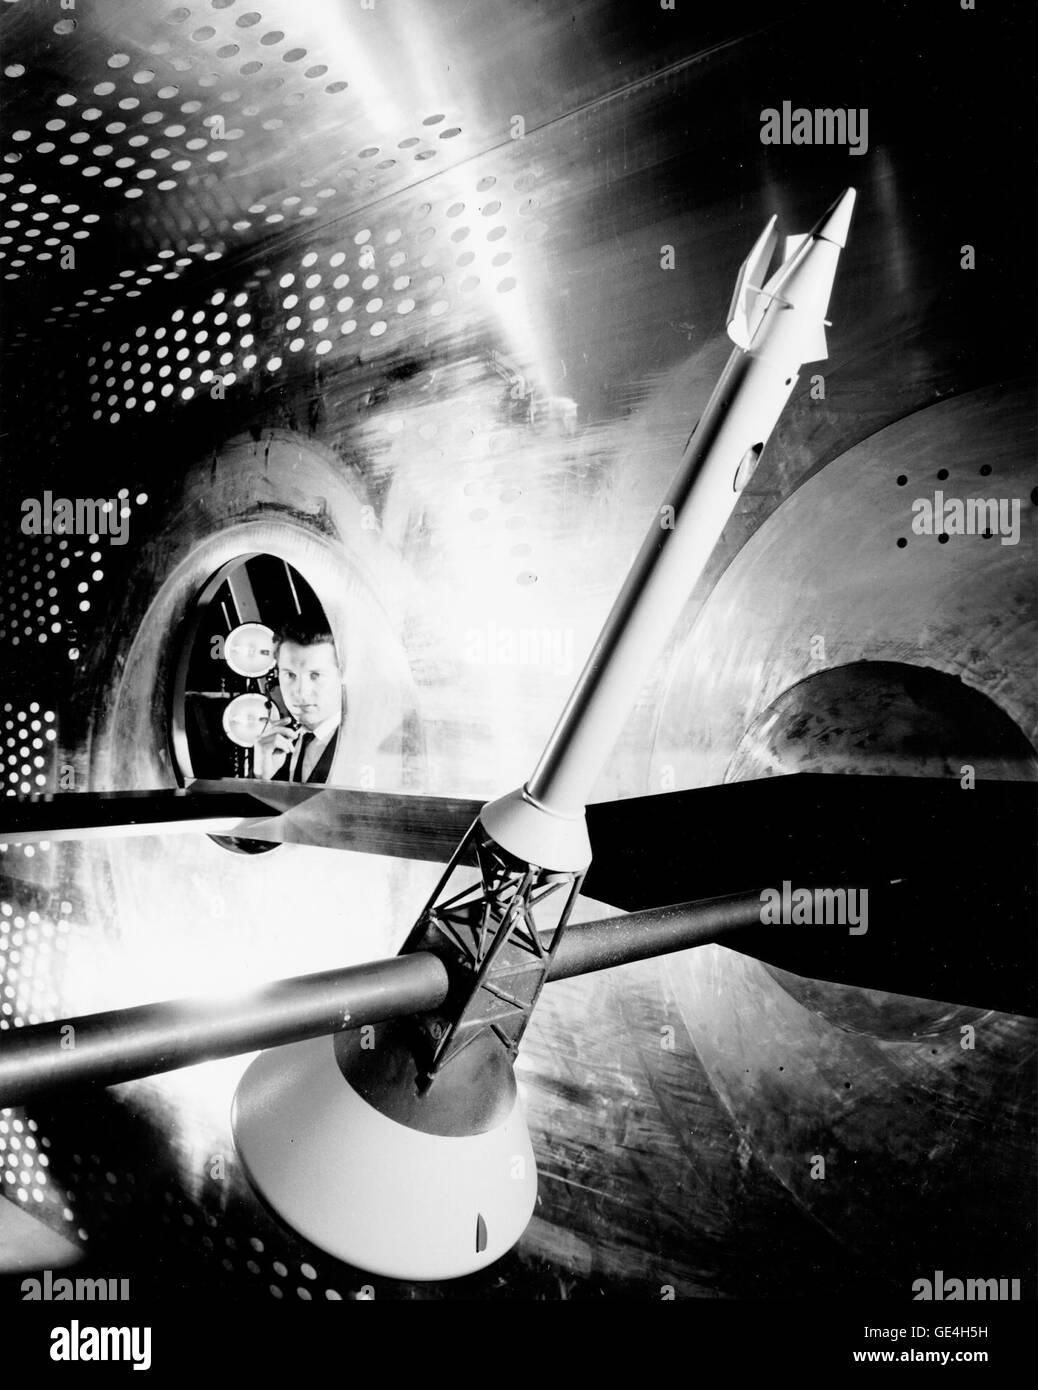 Transonic Wind Tunnel Stockfotos & Transonic Wind Tunnel Bilder - Alamy